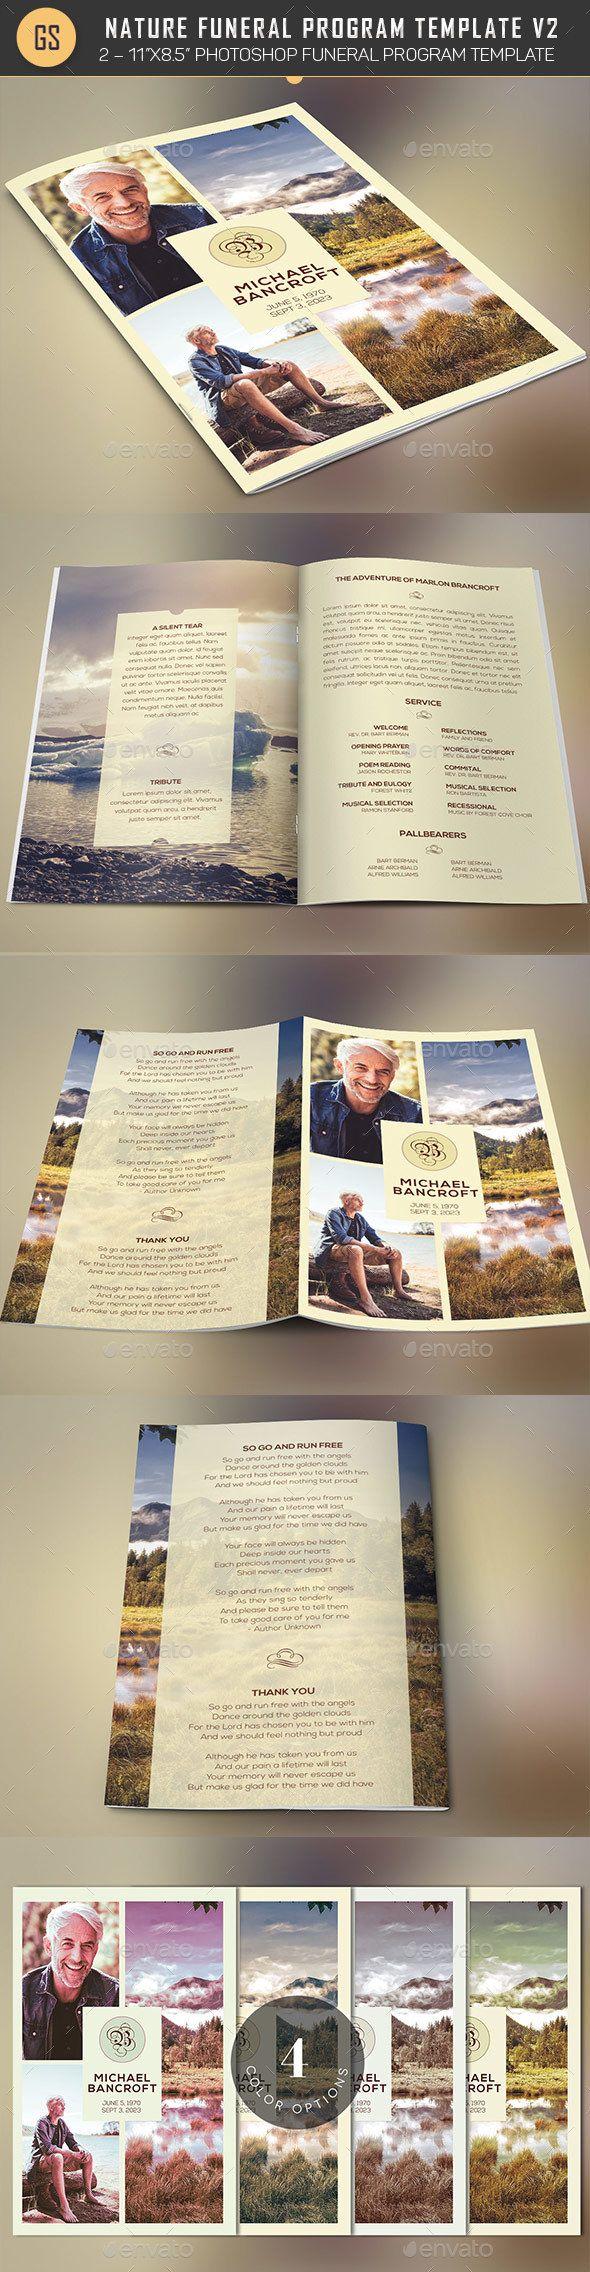 Nature Funeral Program Photoshop Template V Funeral Brochures - Informational brochure template